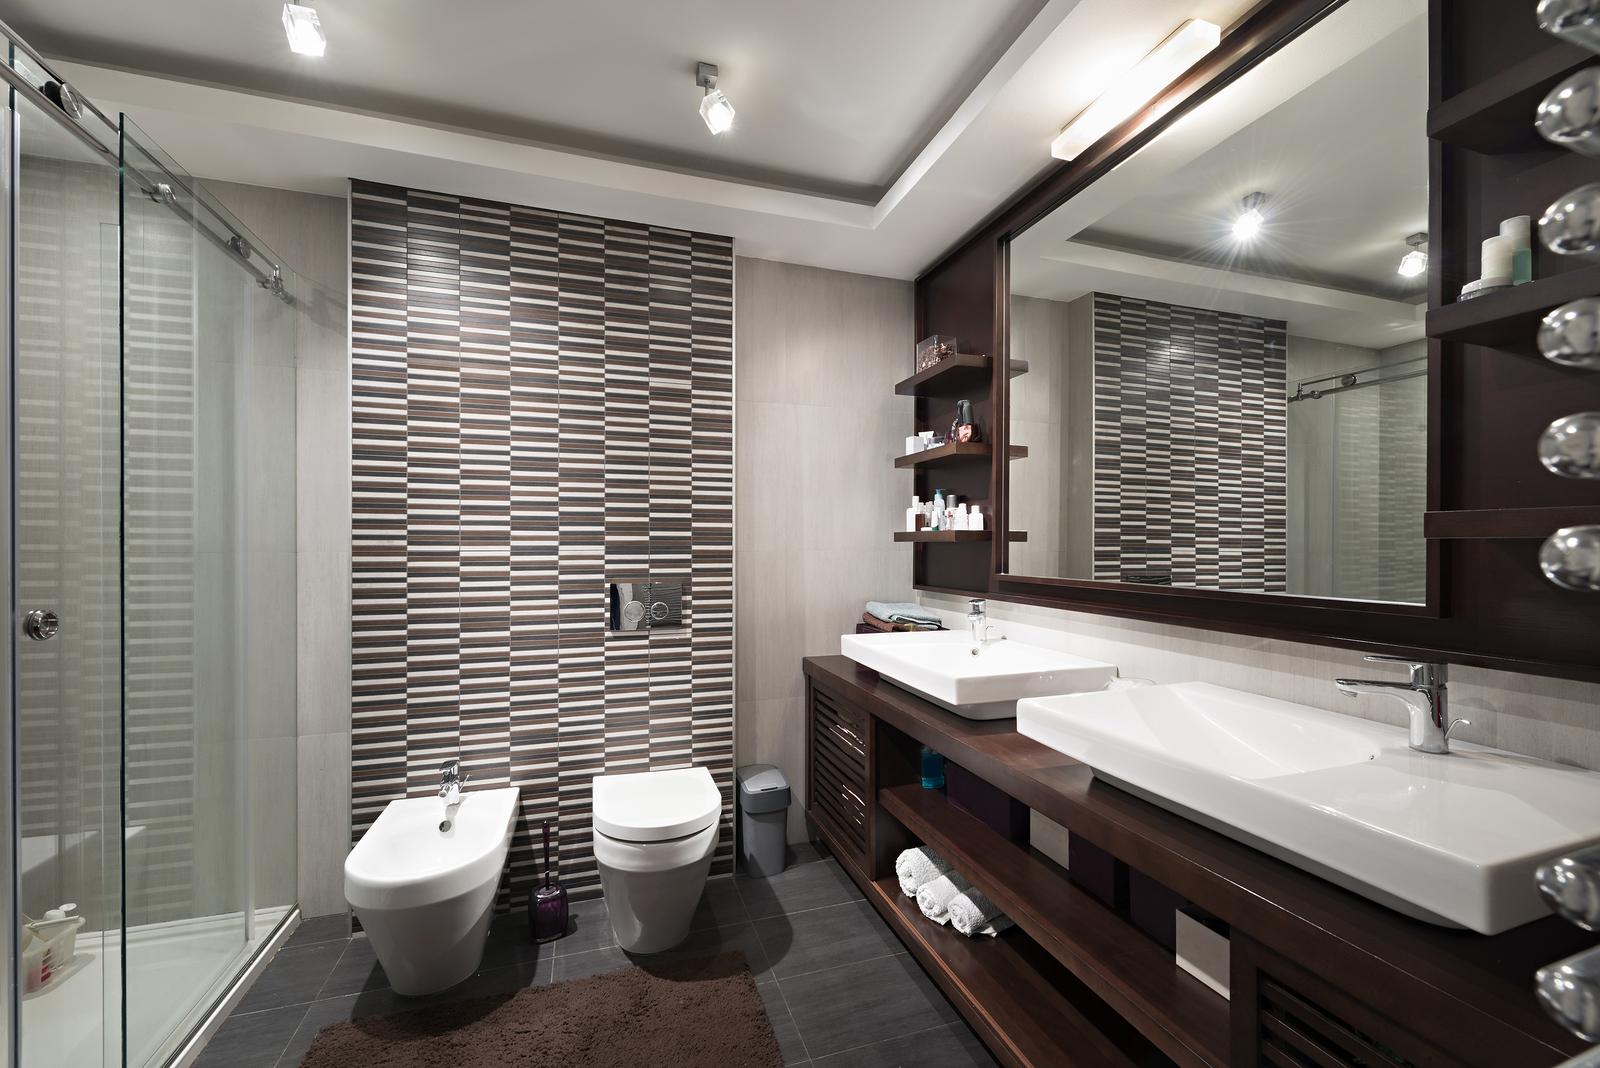 bigstock-Bathroom-Interior-107373296.jpg